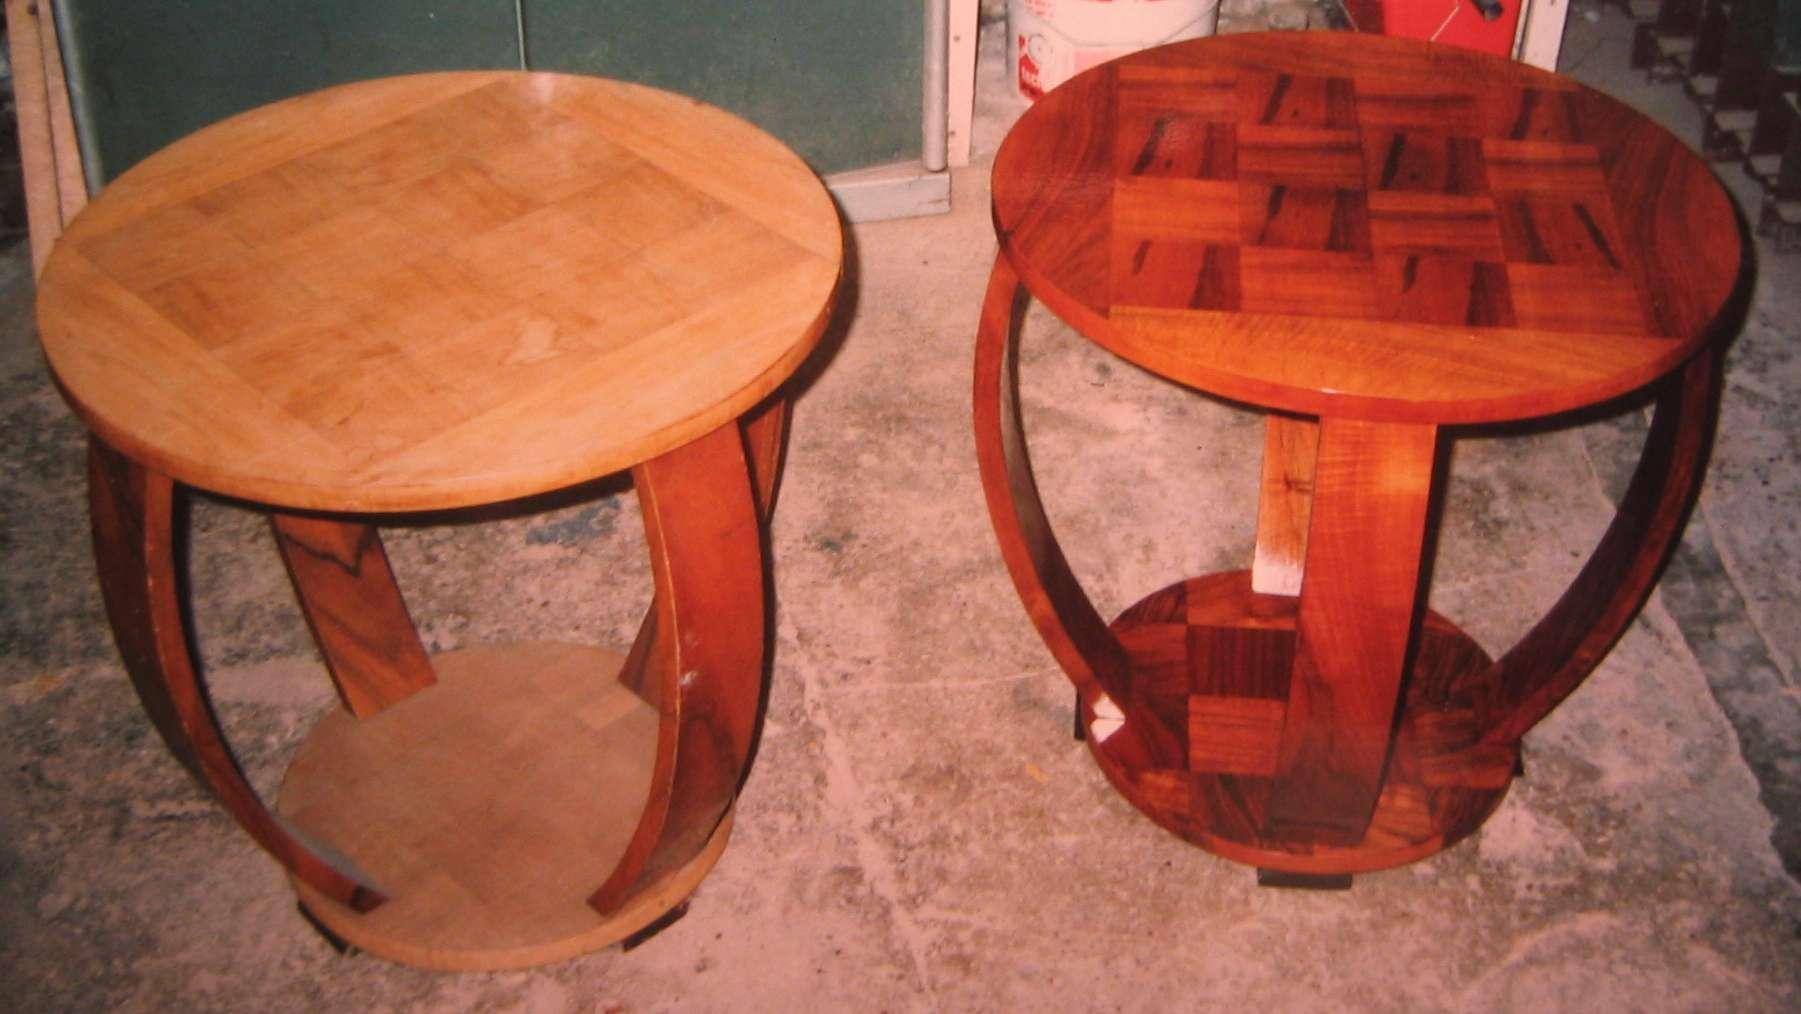 ebeniste restaurateur de meubles christian pierre vandenbosch maitre artisan. Black Bedroom Furniture Sets. Home Design Ideas